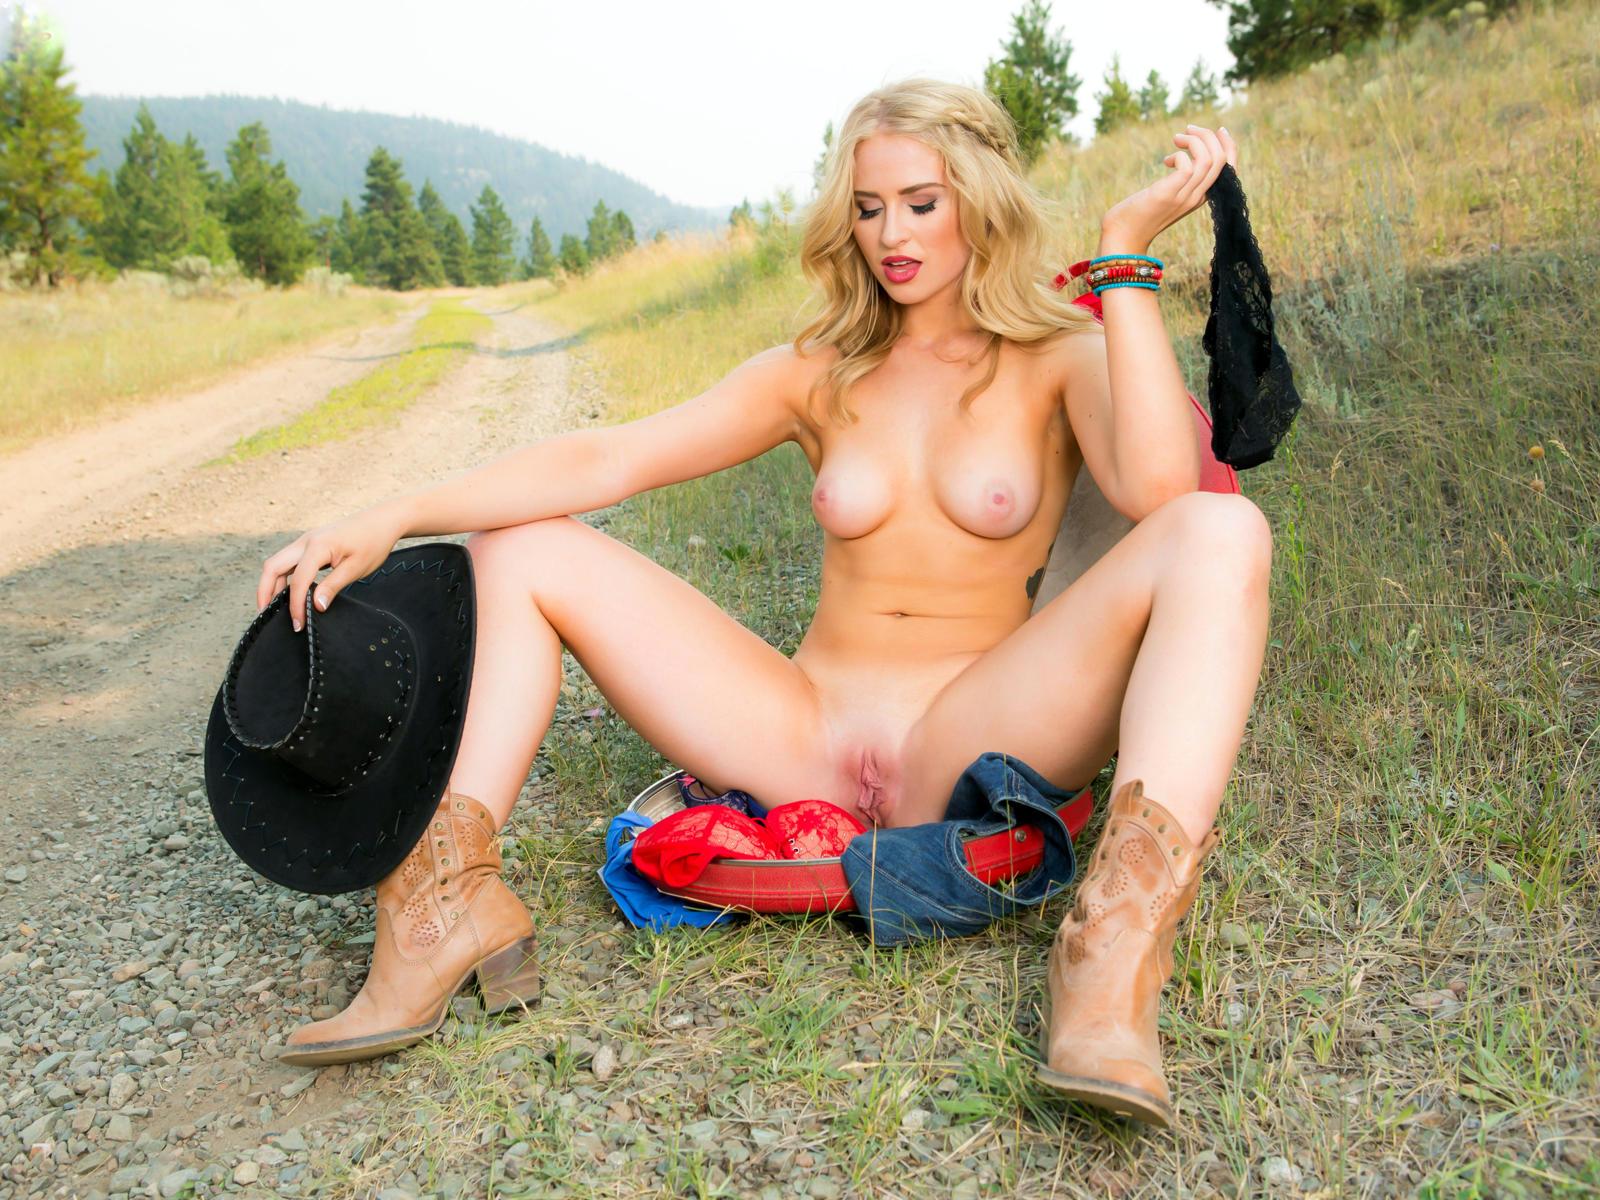 free pics of hot sexy girls